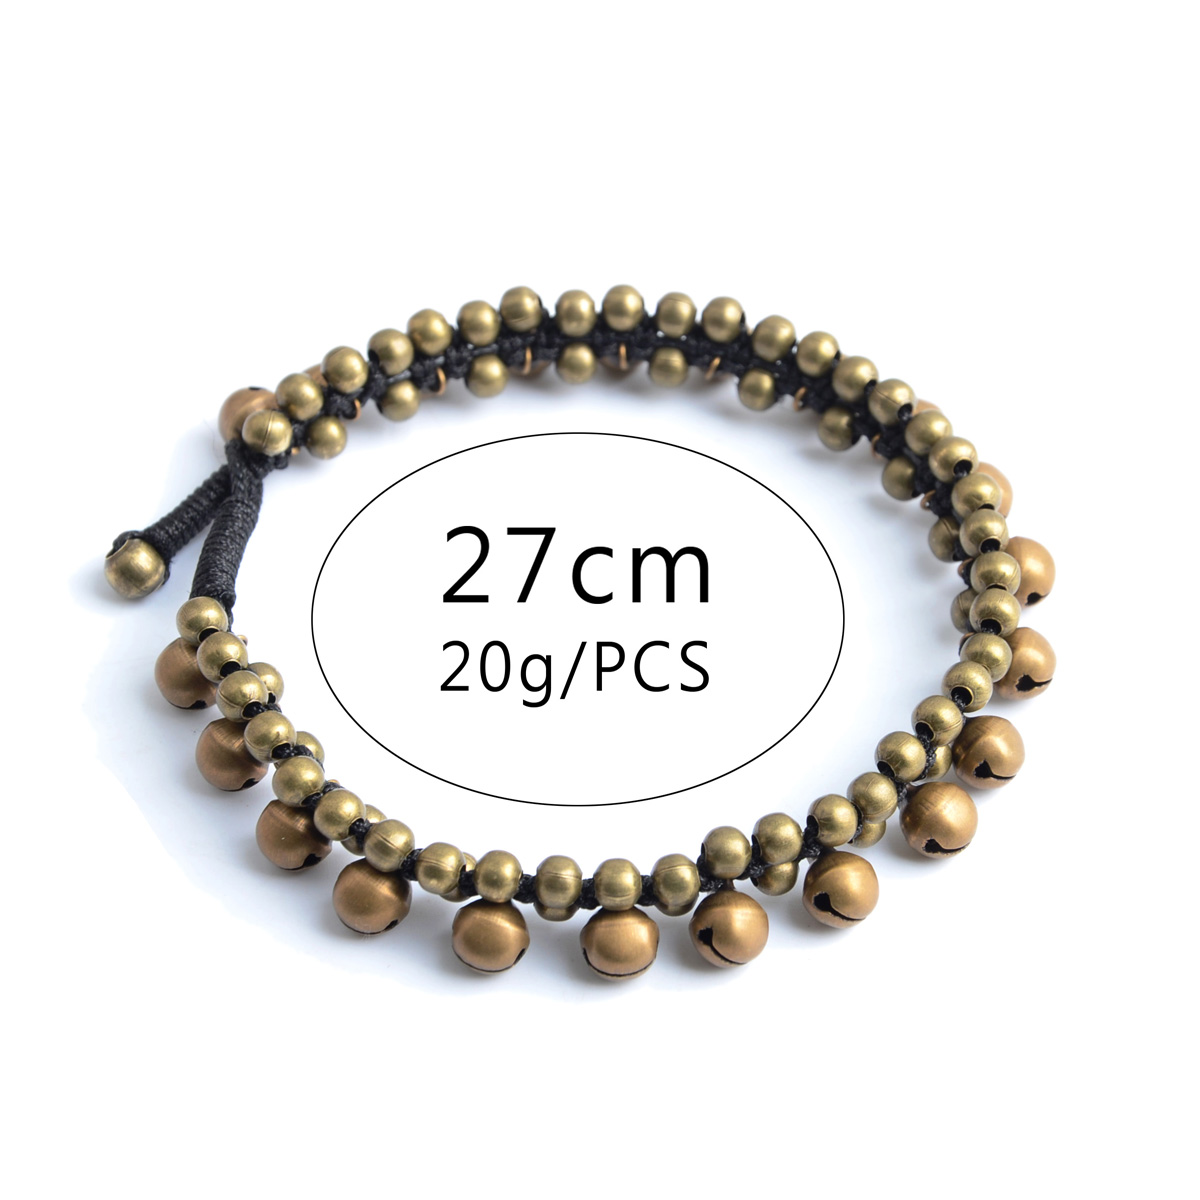 Vintage Boho Bracelet Foot Jewelry Pulseras Retro Jingle Bell Anklet Women Girl Ankle Leg Chain Charm Bracelet Fashion Jewelry